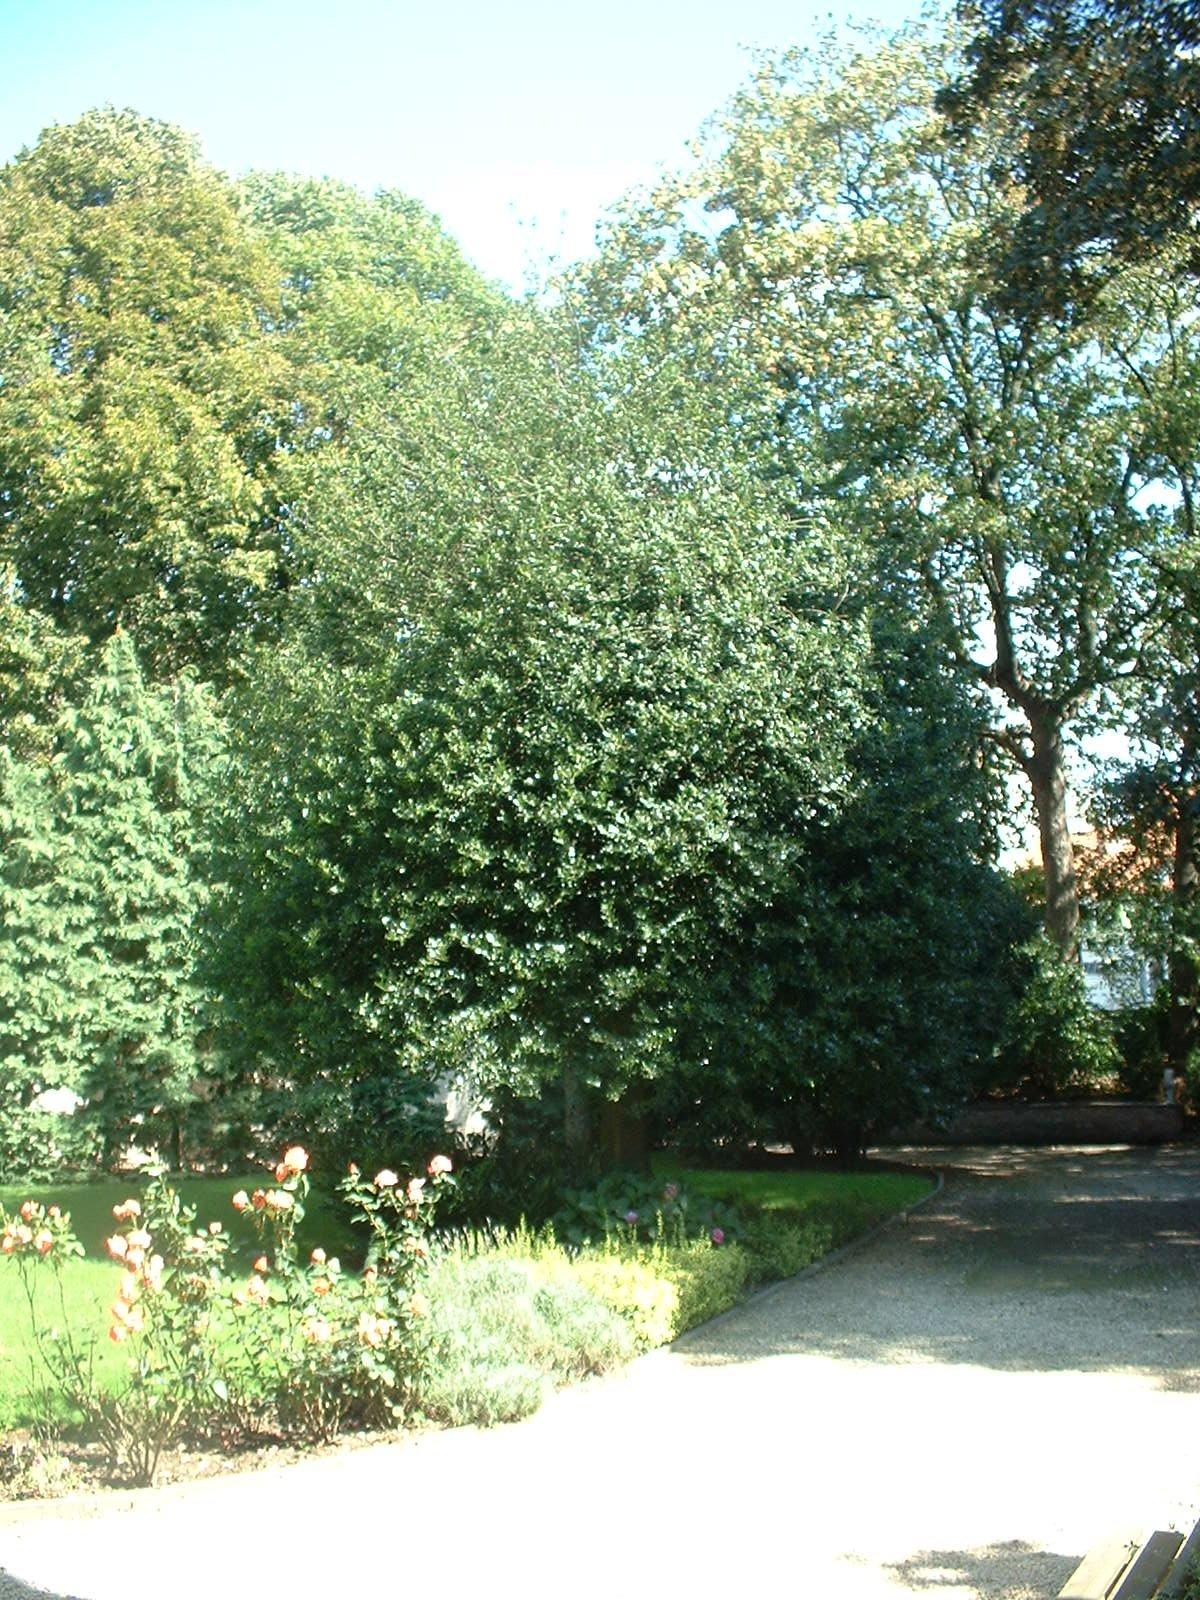 Hulst – Sint-Jans-Molenbeek, Vandernootstraat, 29 –  18 August 2004